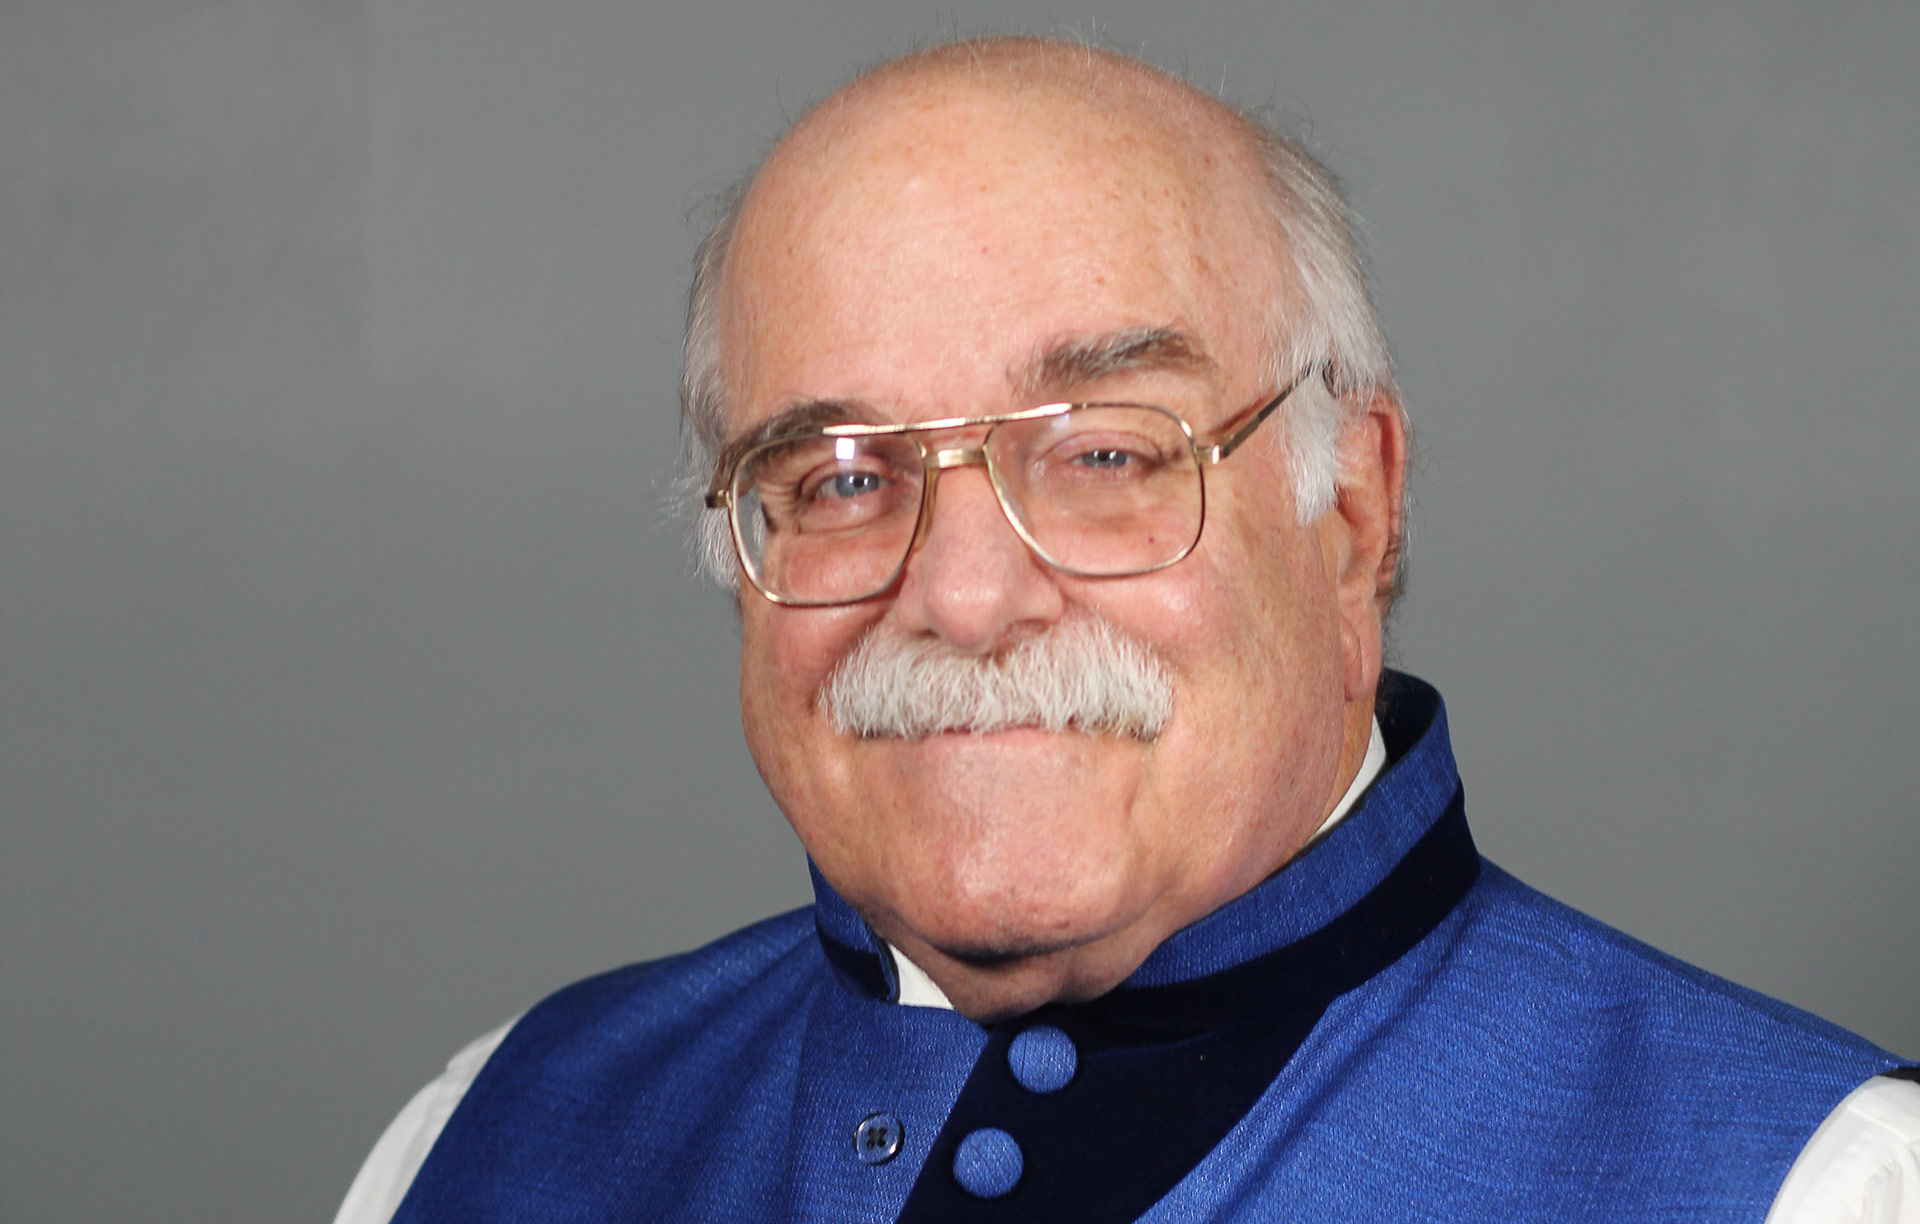 DR. ANDREW DERIER